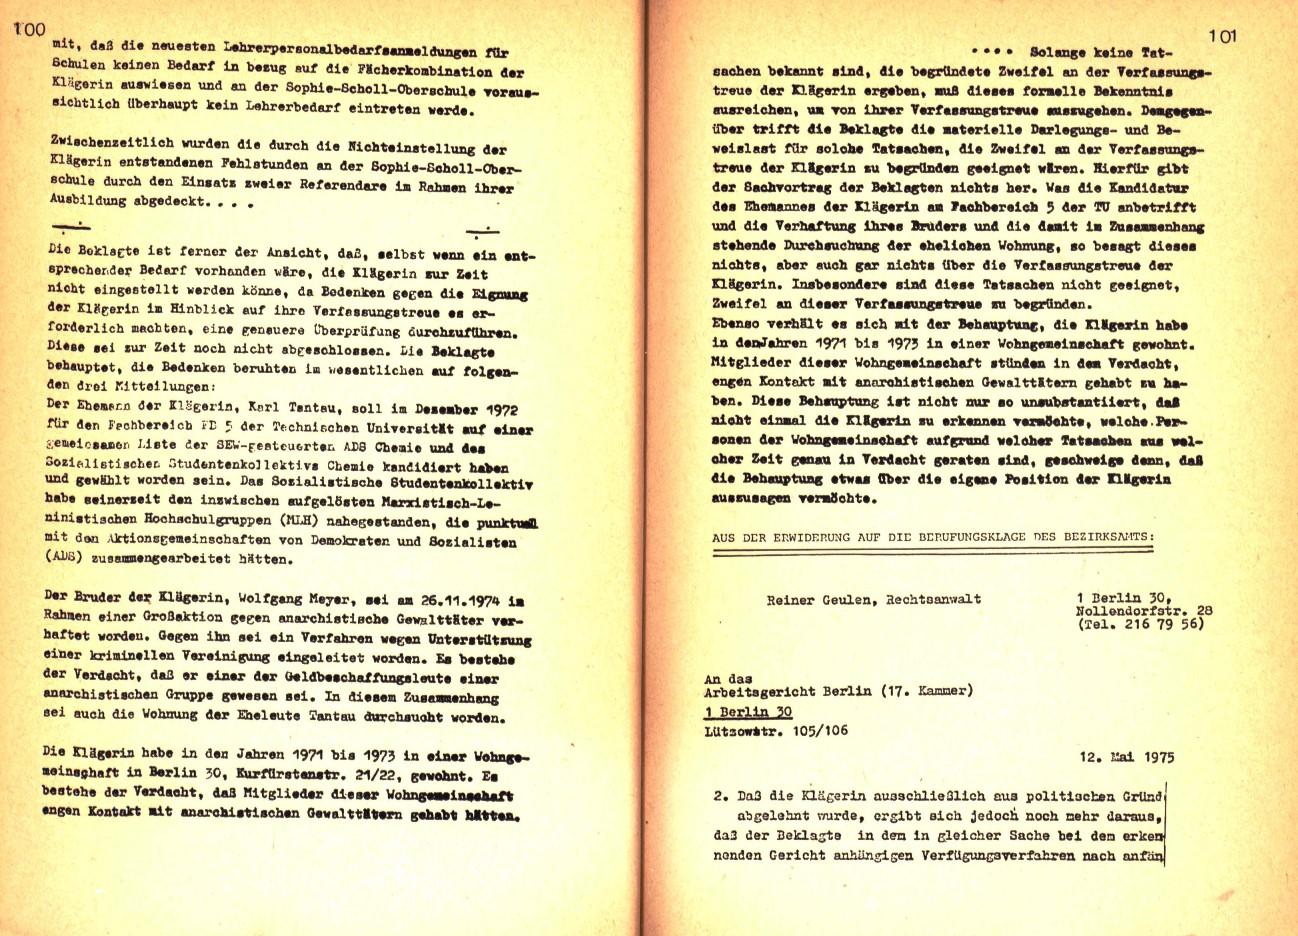 Berlin_VDS_Aktionskomitee_1975_BerufsverboteII_52